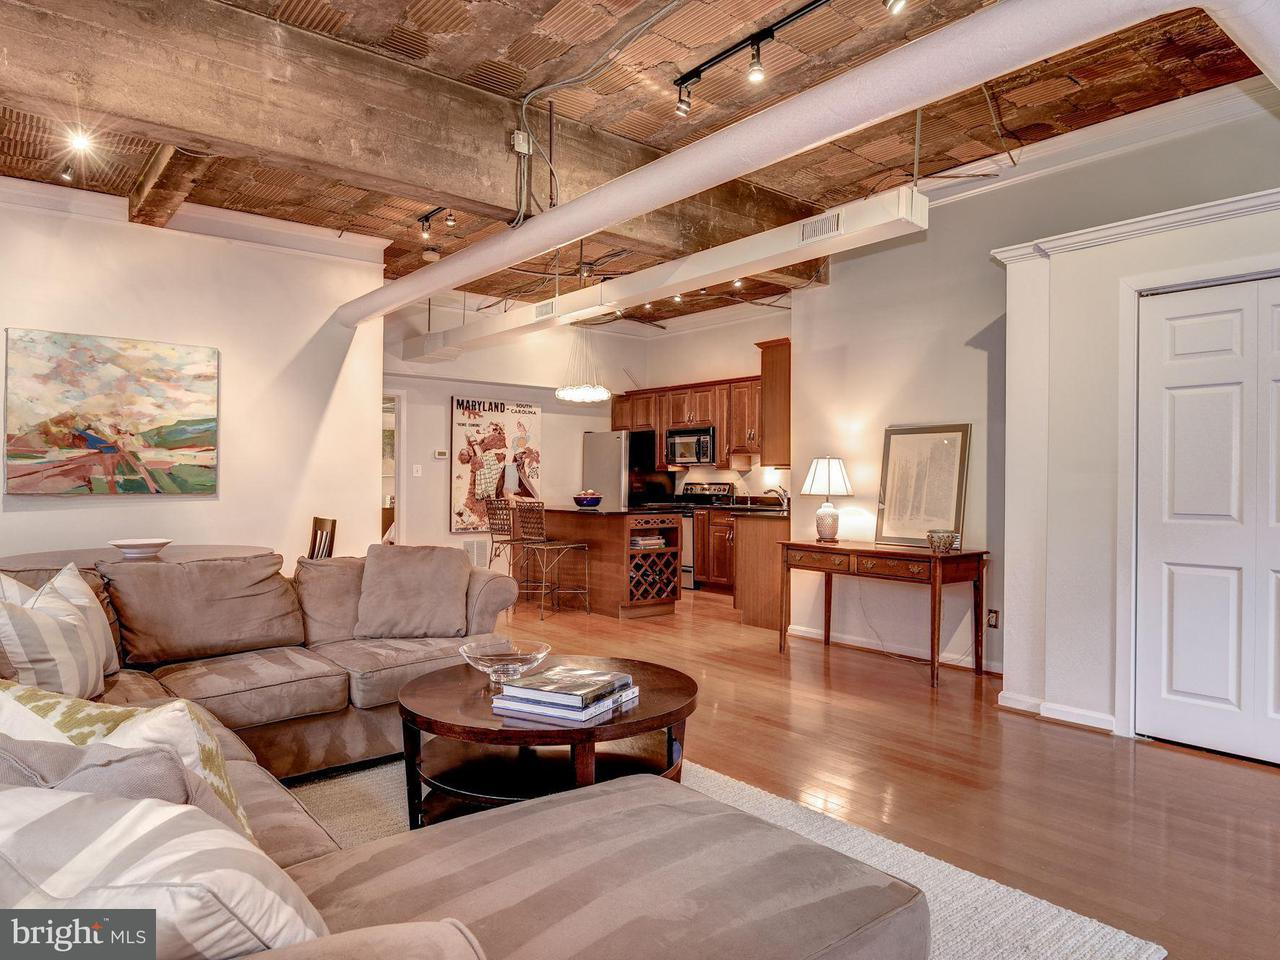 Condominium for Sale at 4514 Connecticut Ave Nw #B 4514 Connecticut Ave Nw #B Washington, District Of Columbia 20008 United States